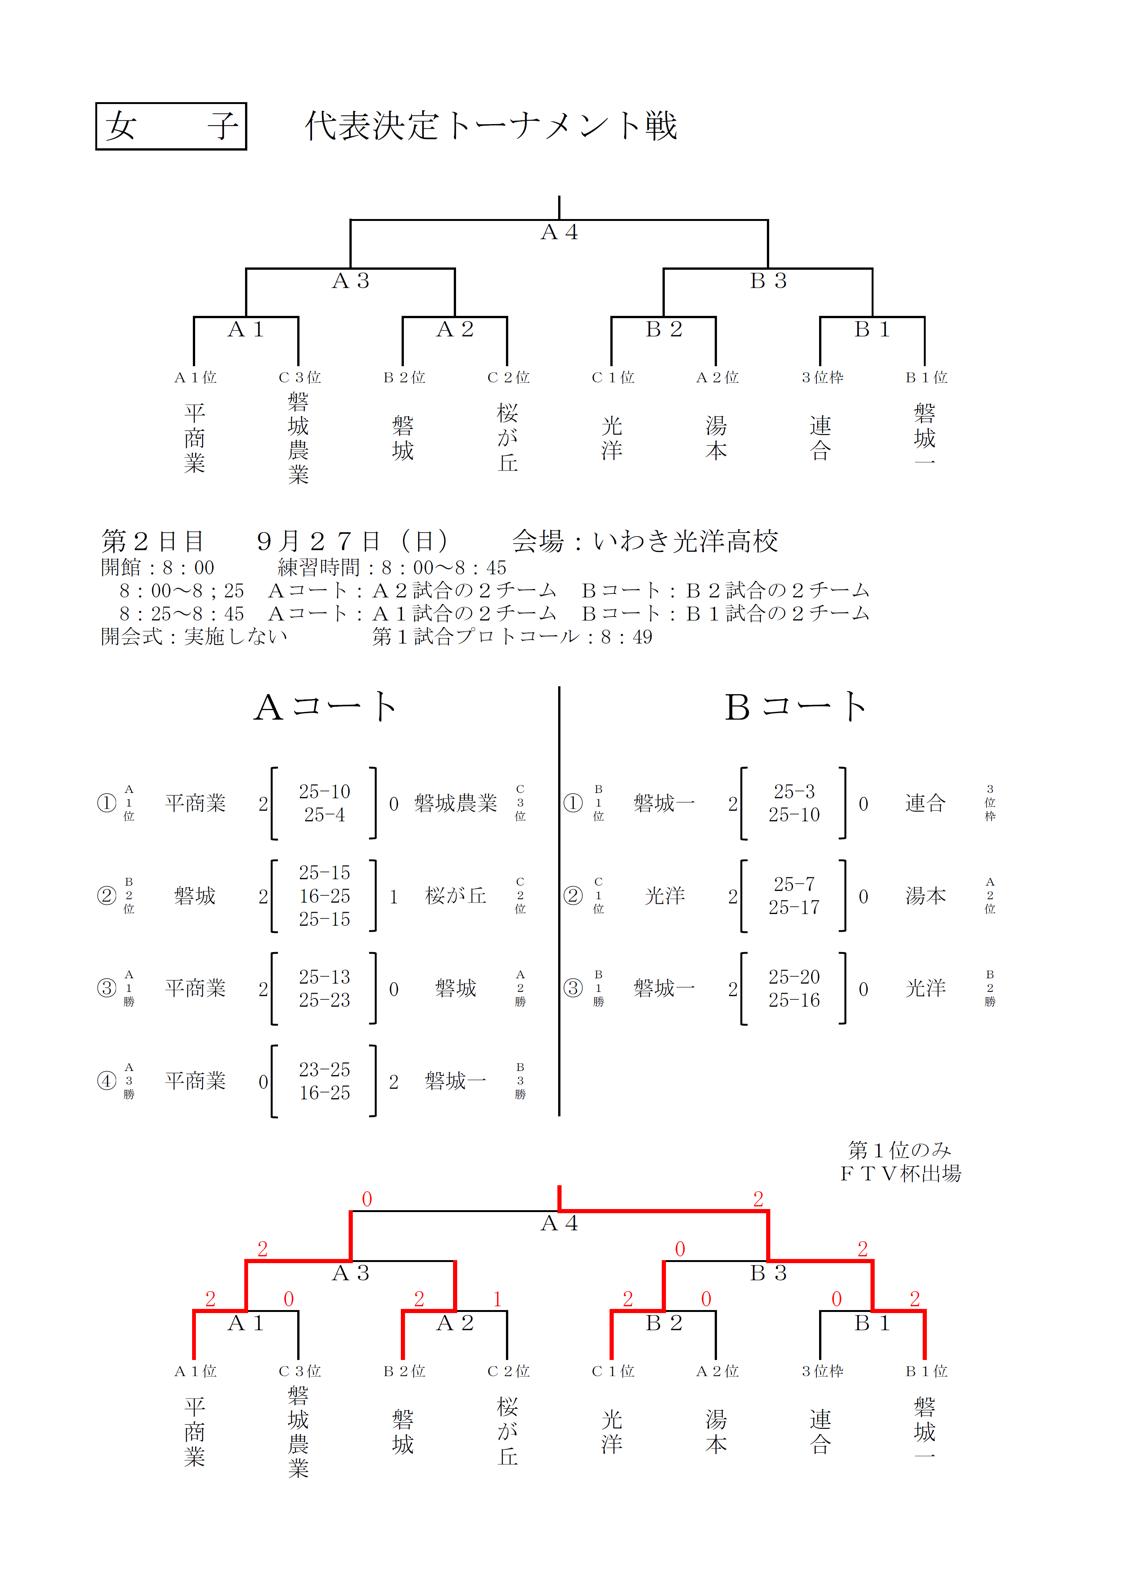 2020年度_全日本高校選手権_福島予選_いわき地区_女子_結果3